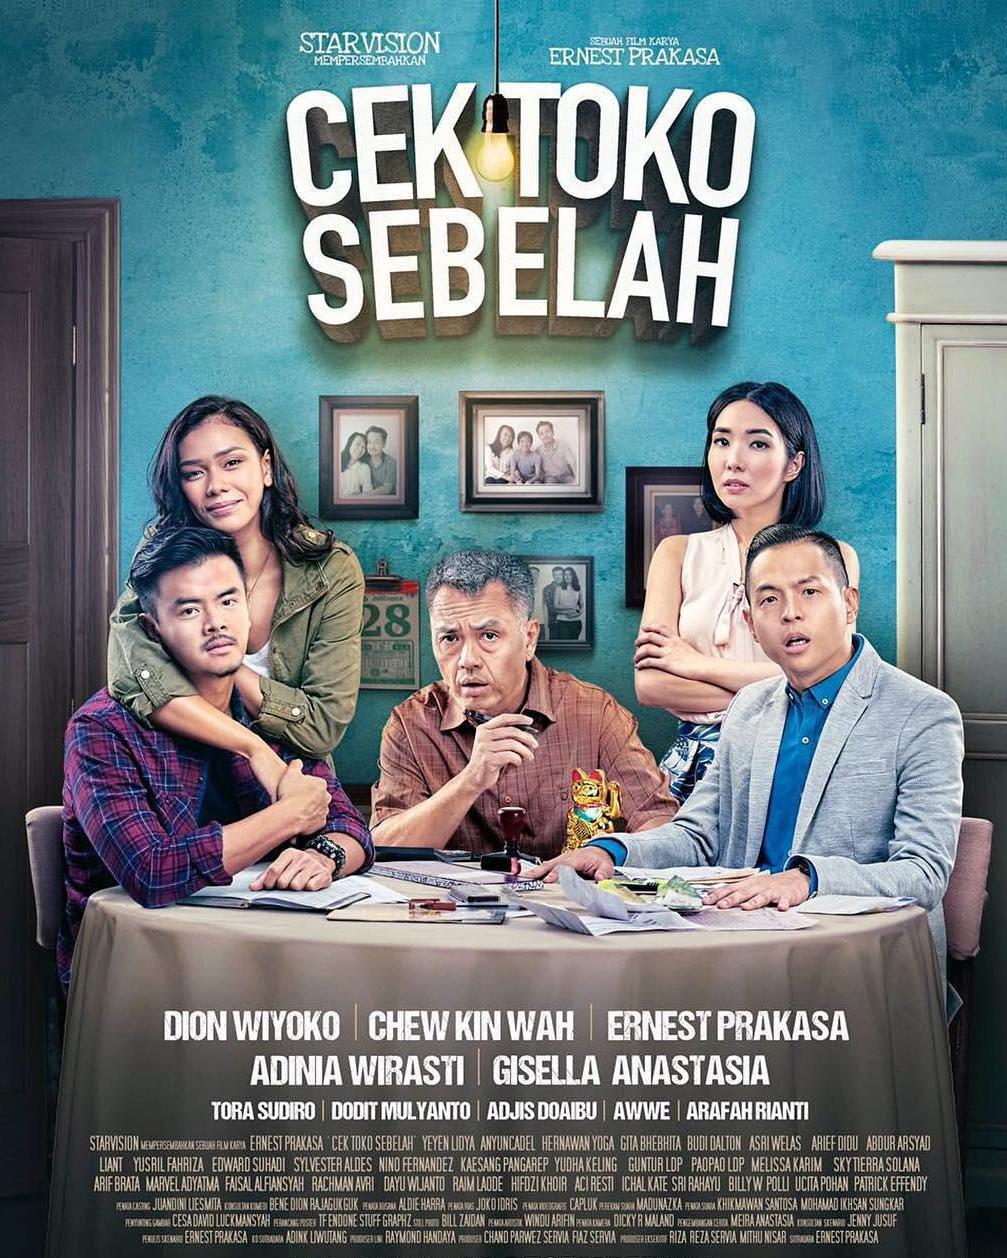 Cek Toko Sebelah_filmposter